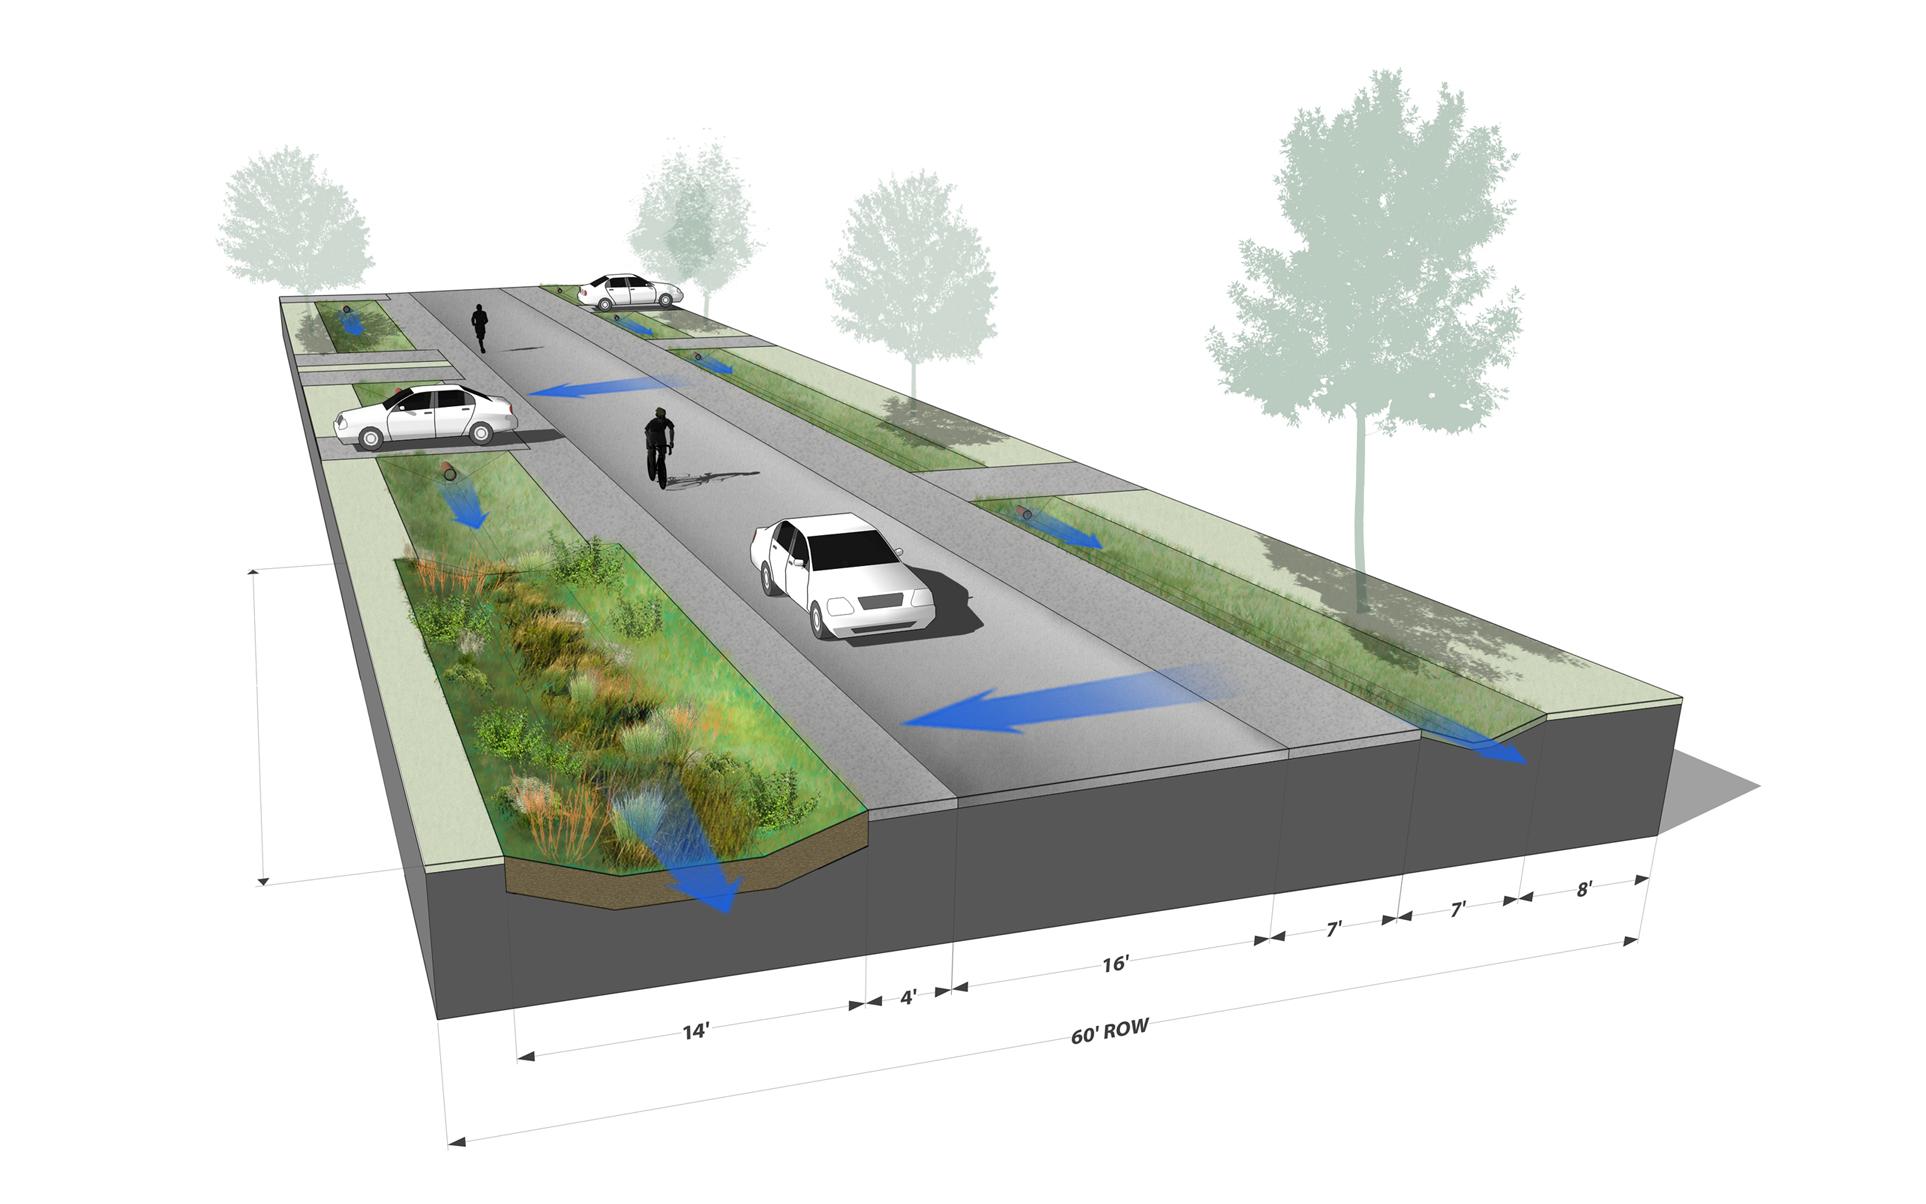 ERrol Heights Stormwater Master Plan